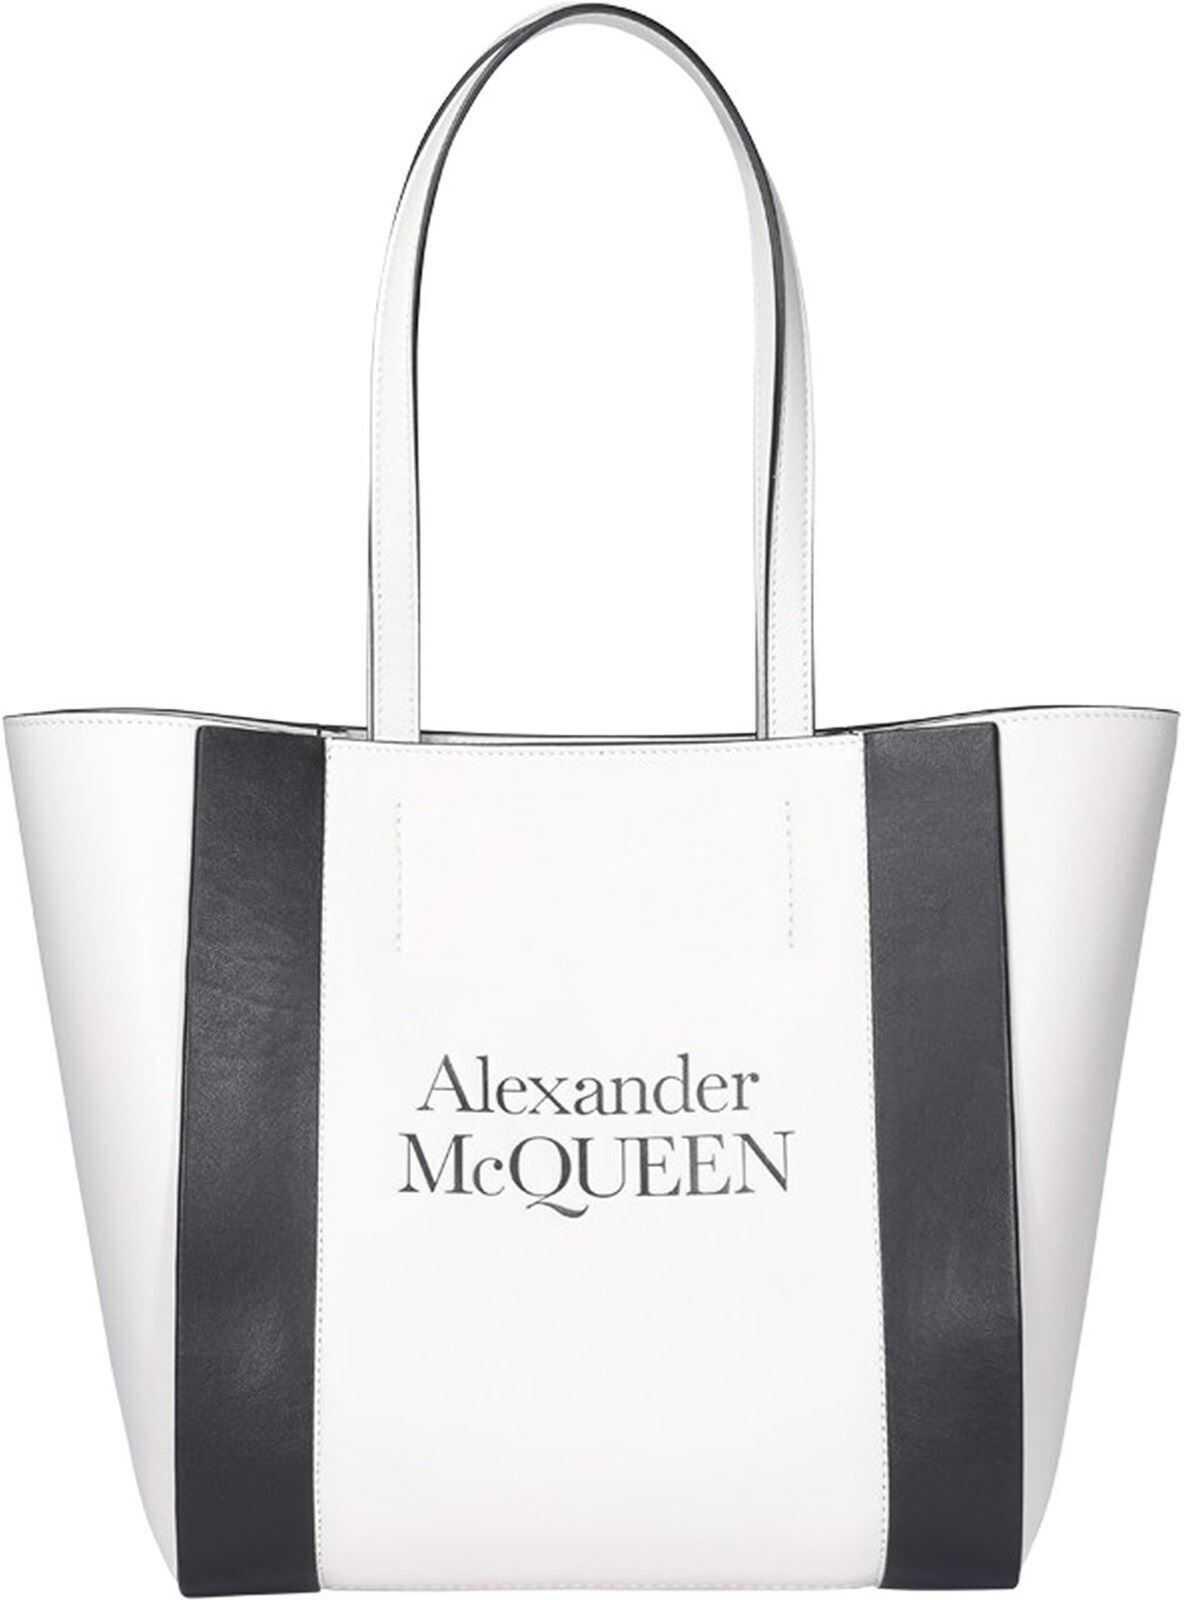 Alexander McQueen Medium Tote Bag In White 6536571X3G19050 White imagine b-mall.ro